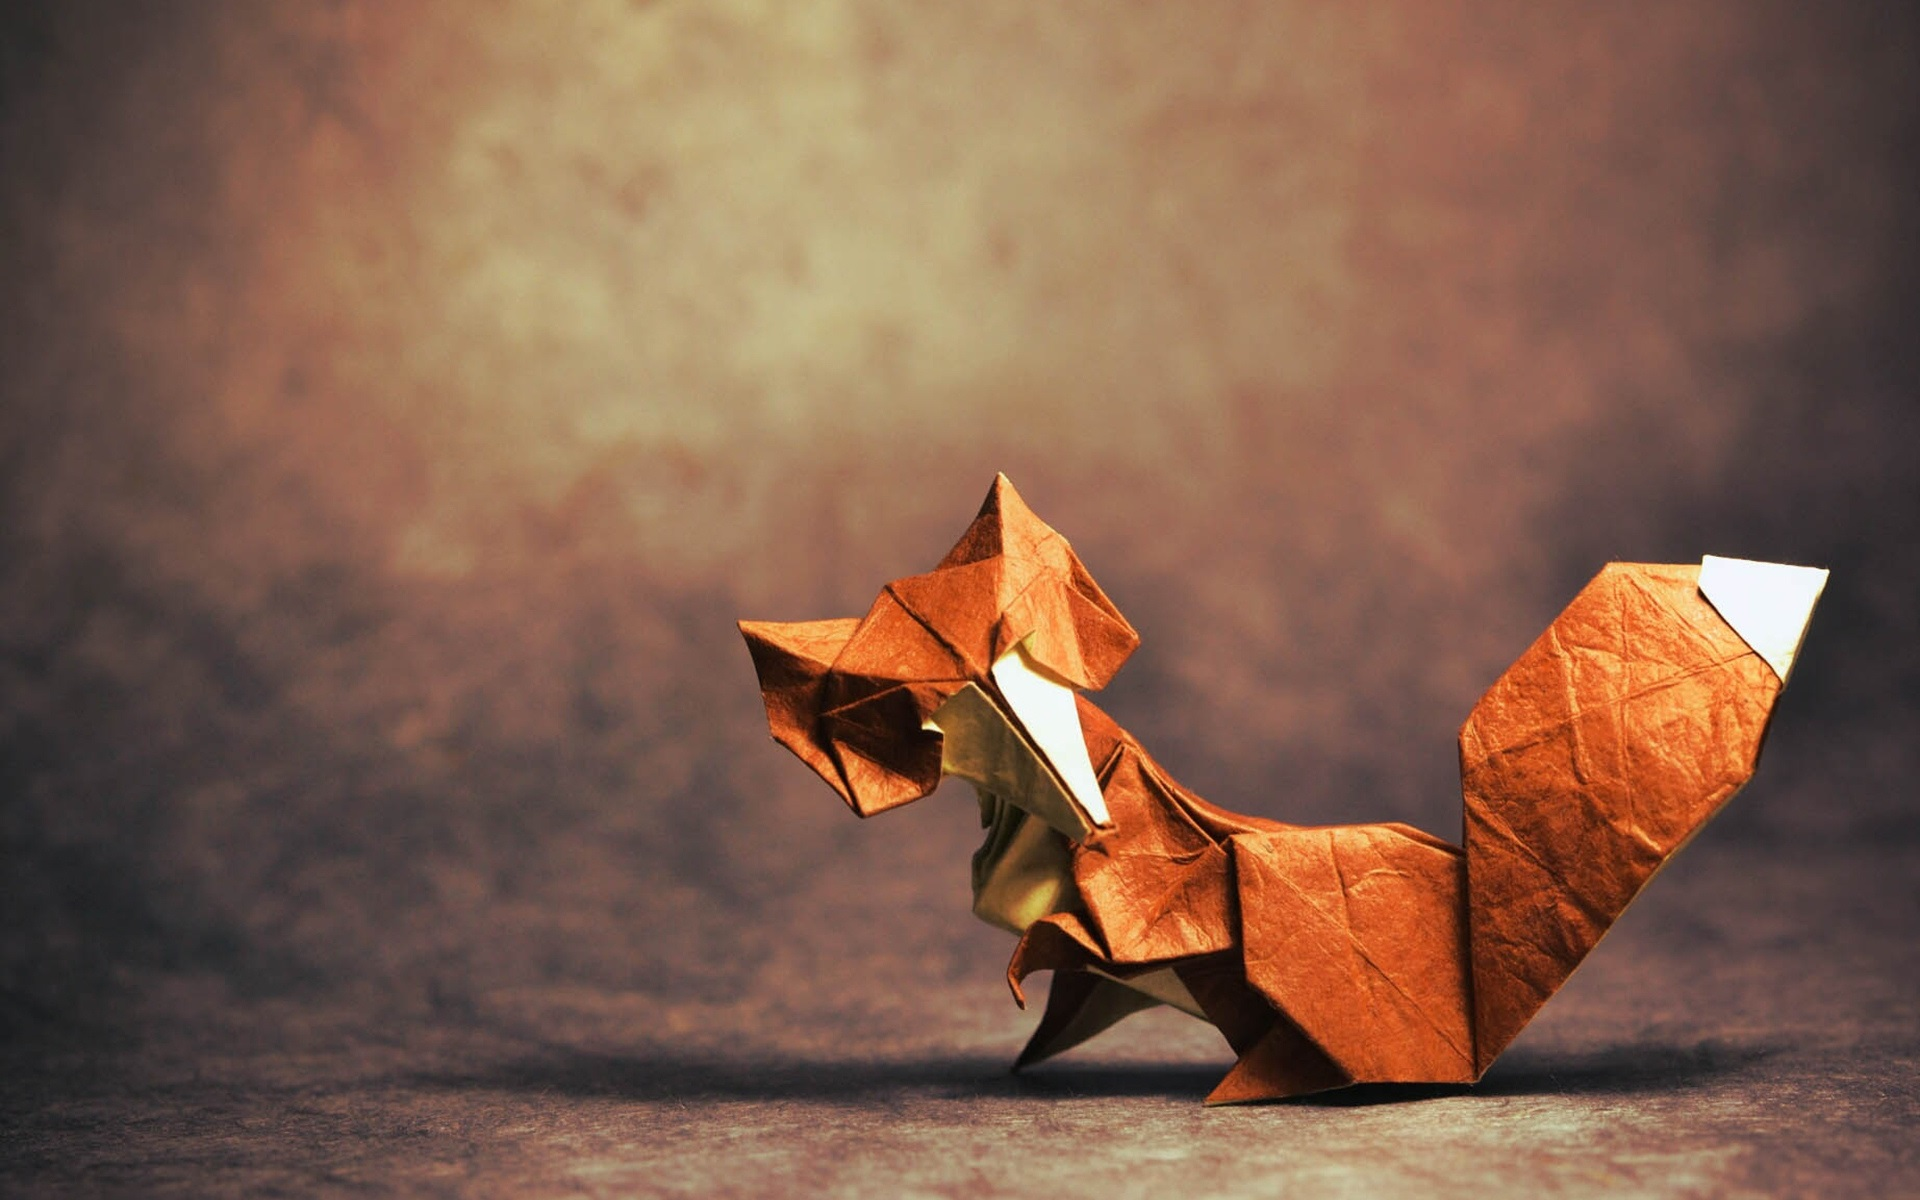 wallpaper origami art, fox 1920x1200 hd picture, image